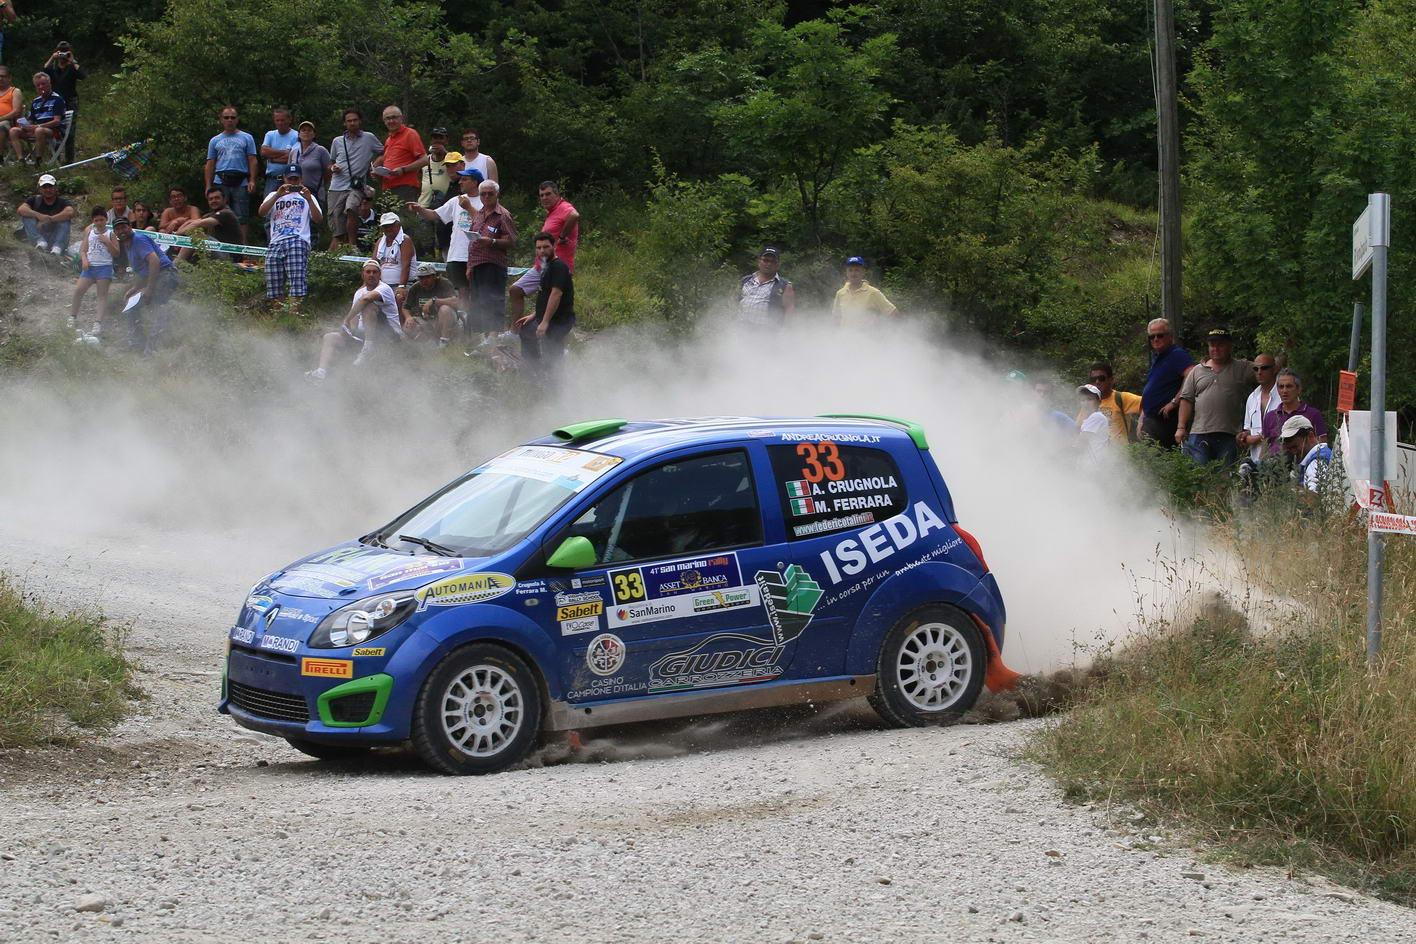 Andrea Crugnola ataca europeanul de raliuri cu echipa Napoca Rally Academy